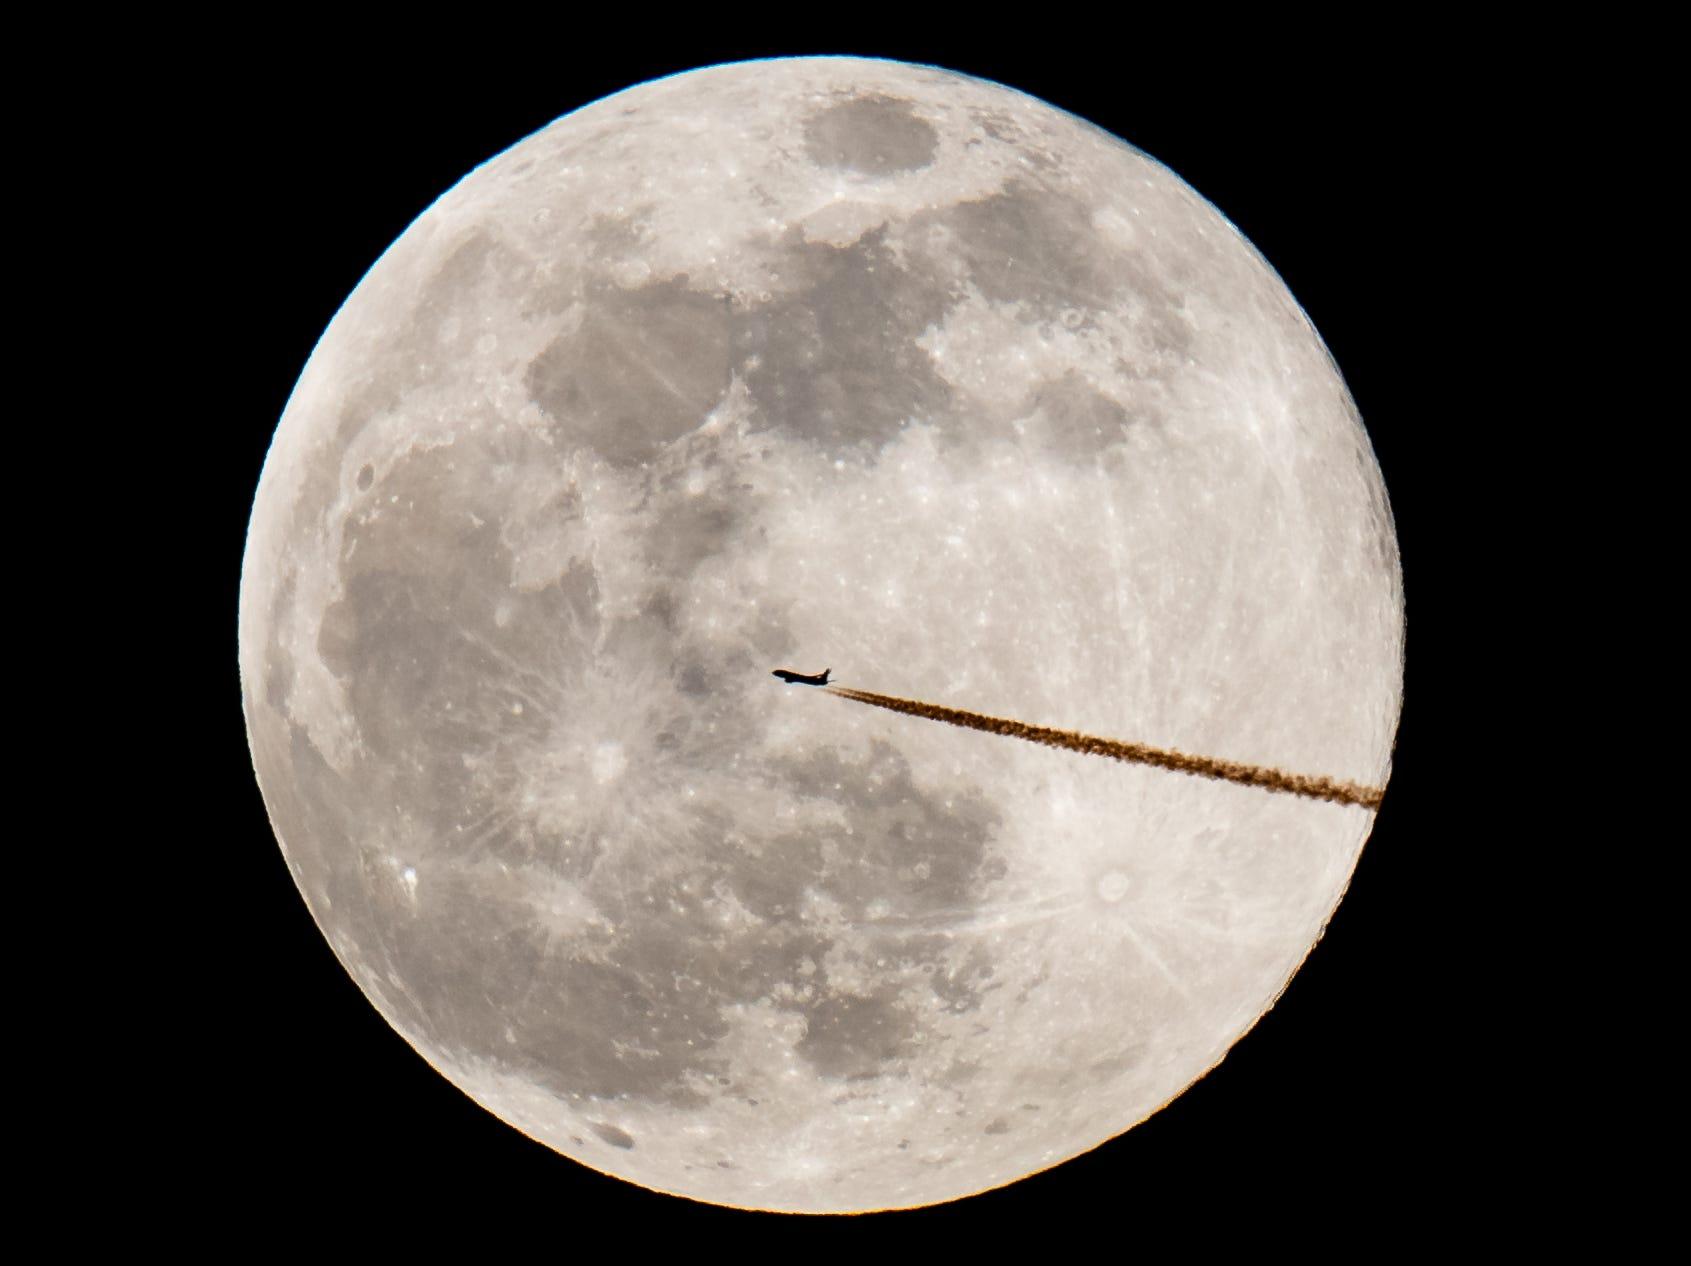 A plane flies past a full moon in Nuremberg on Feb. 19, 2019.